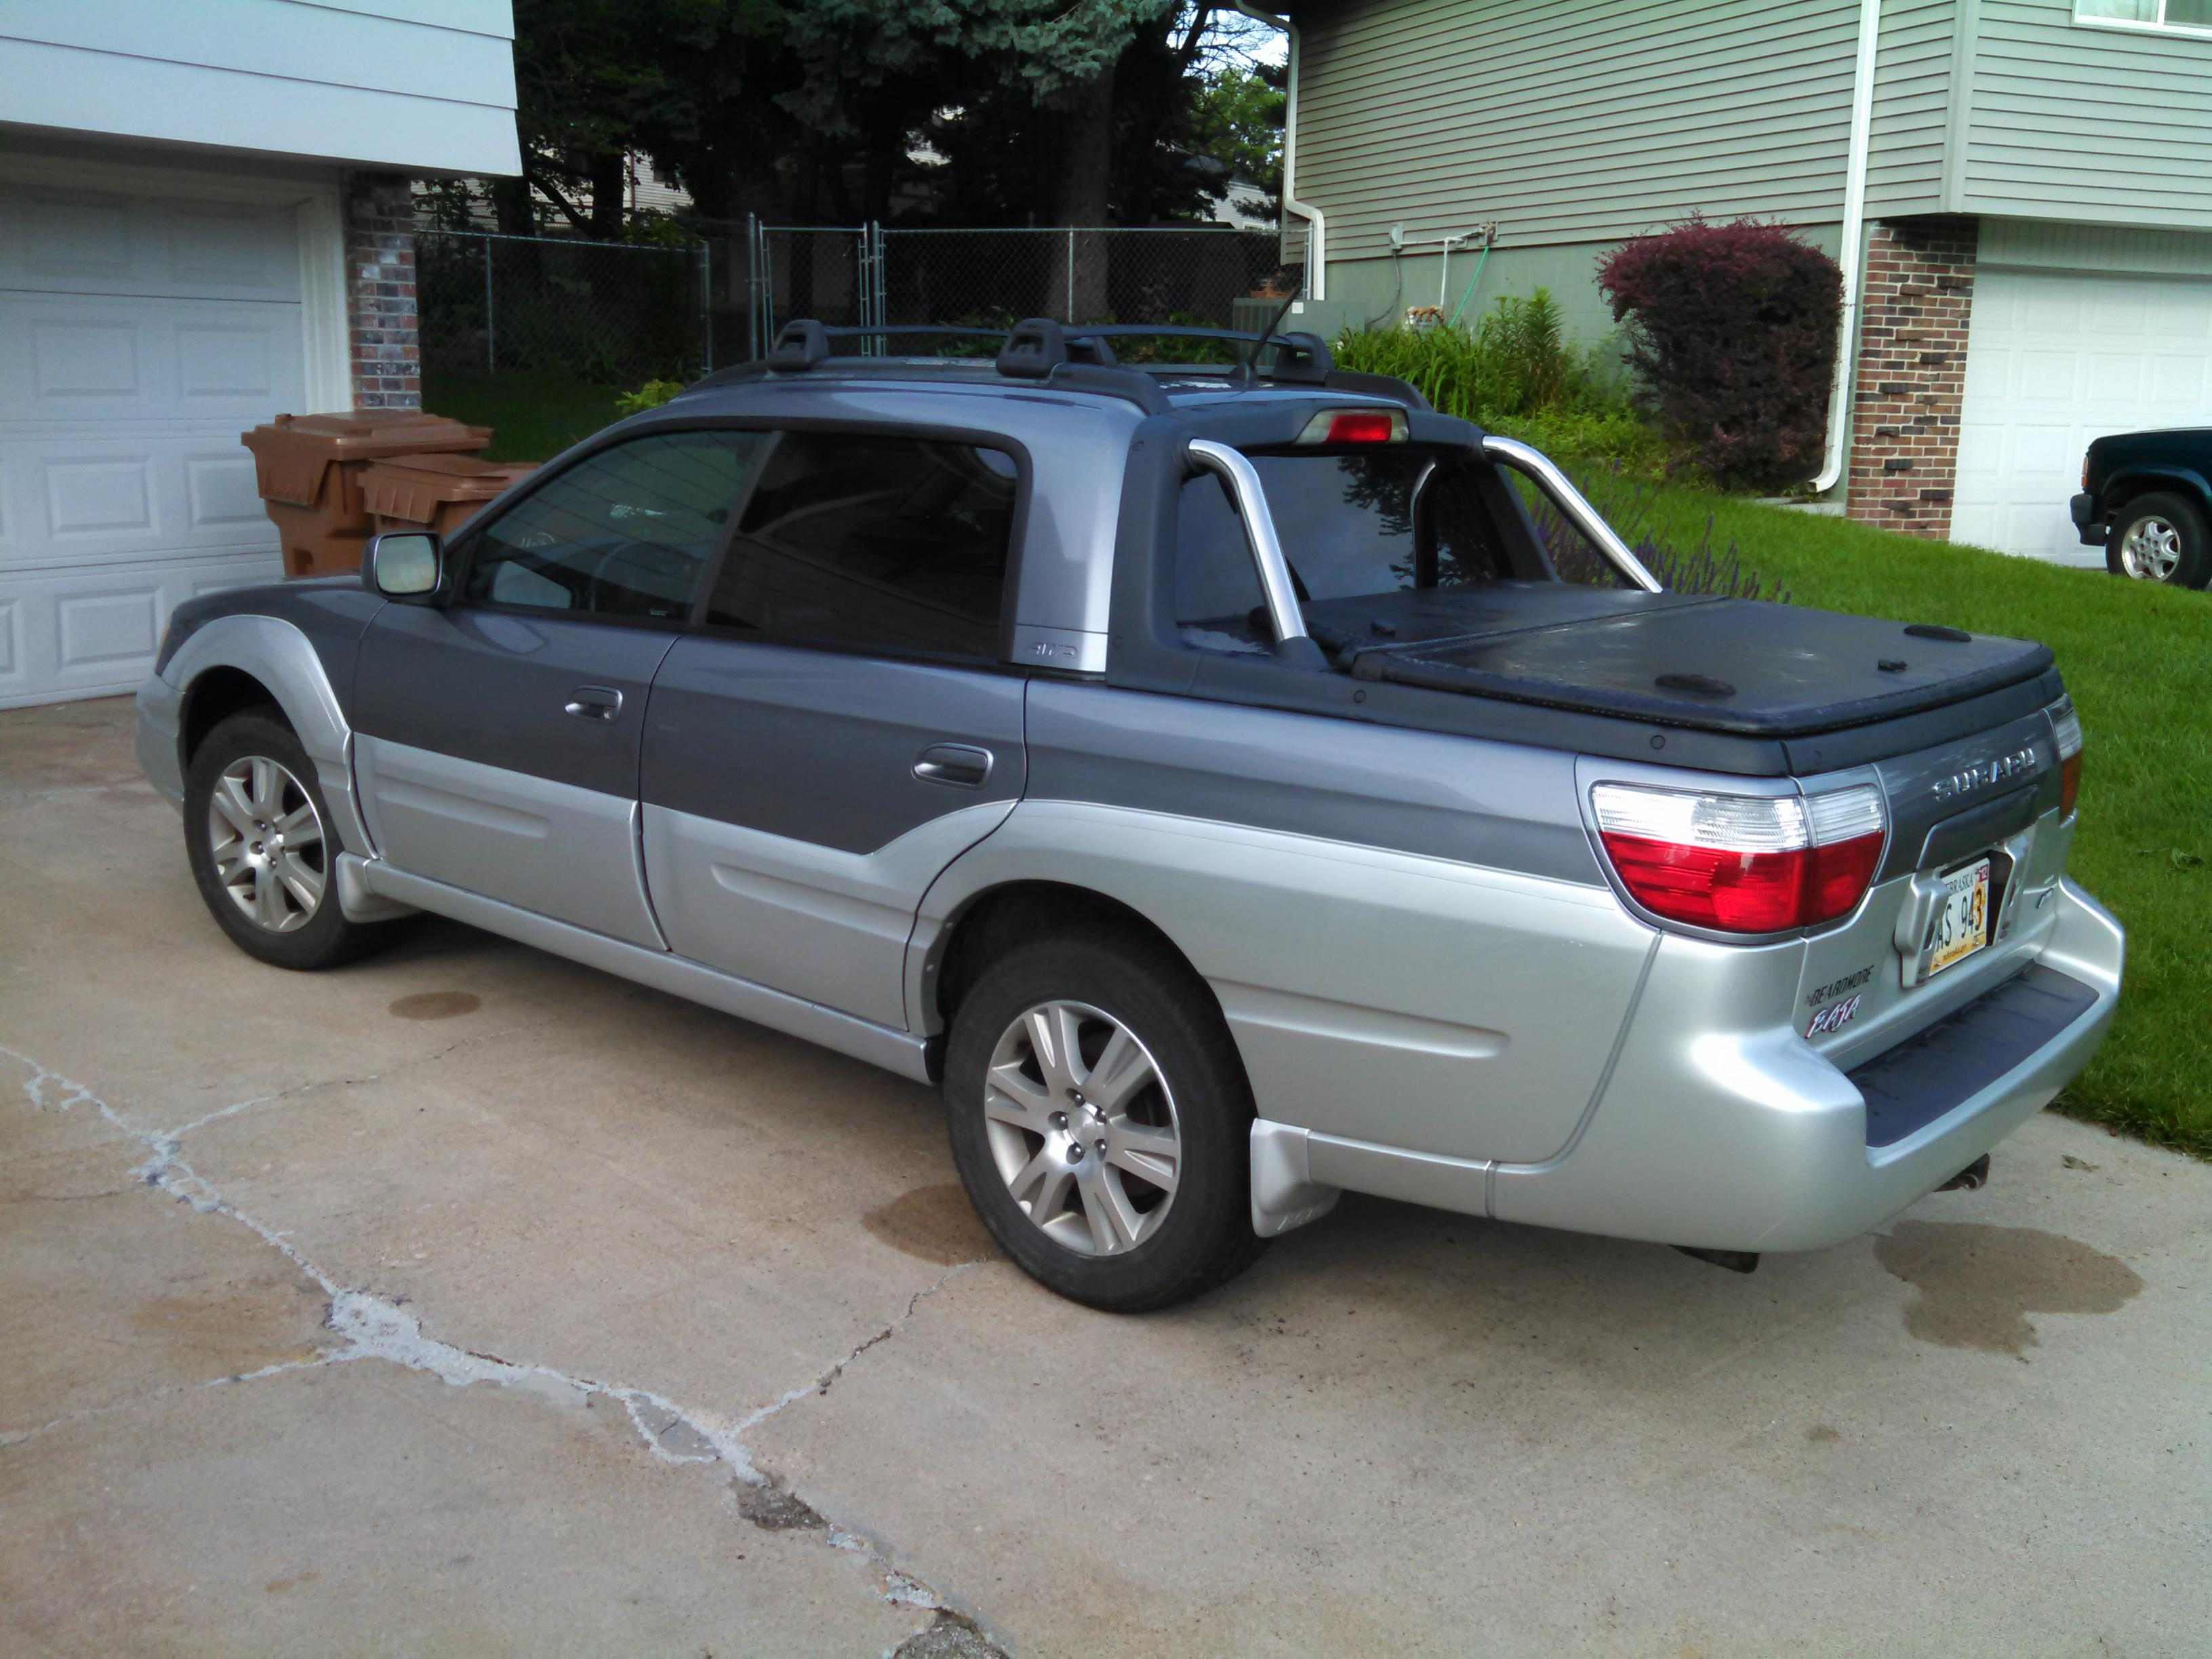 For Sale: 2005 Subaru Baja Turbo w/ 83k - Subaru Outback ...